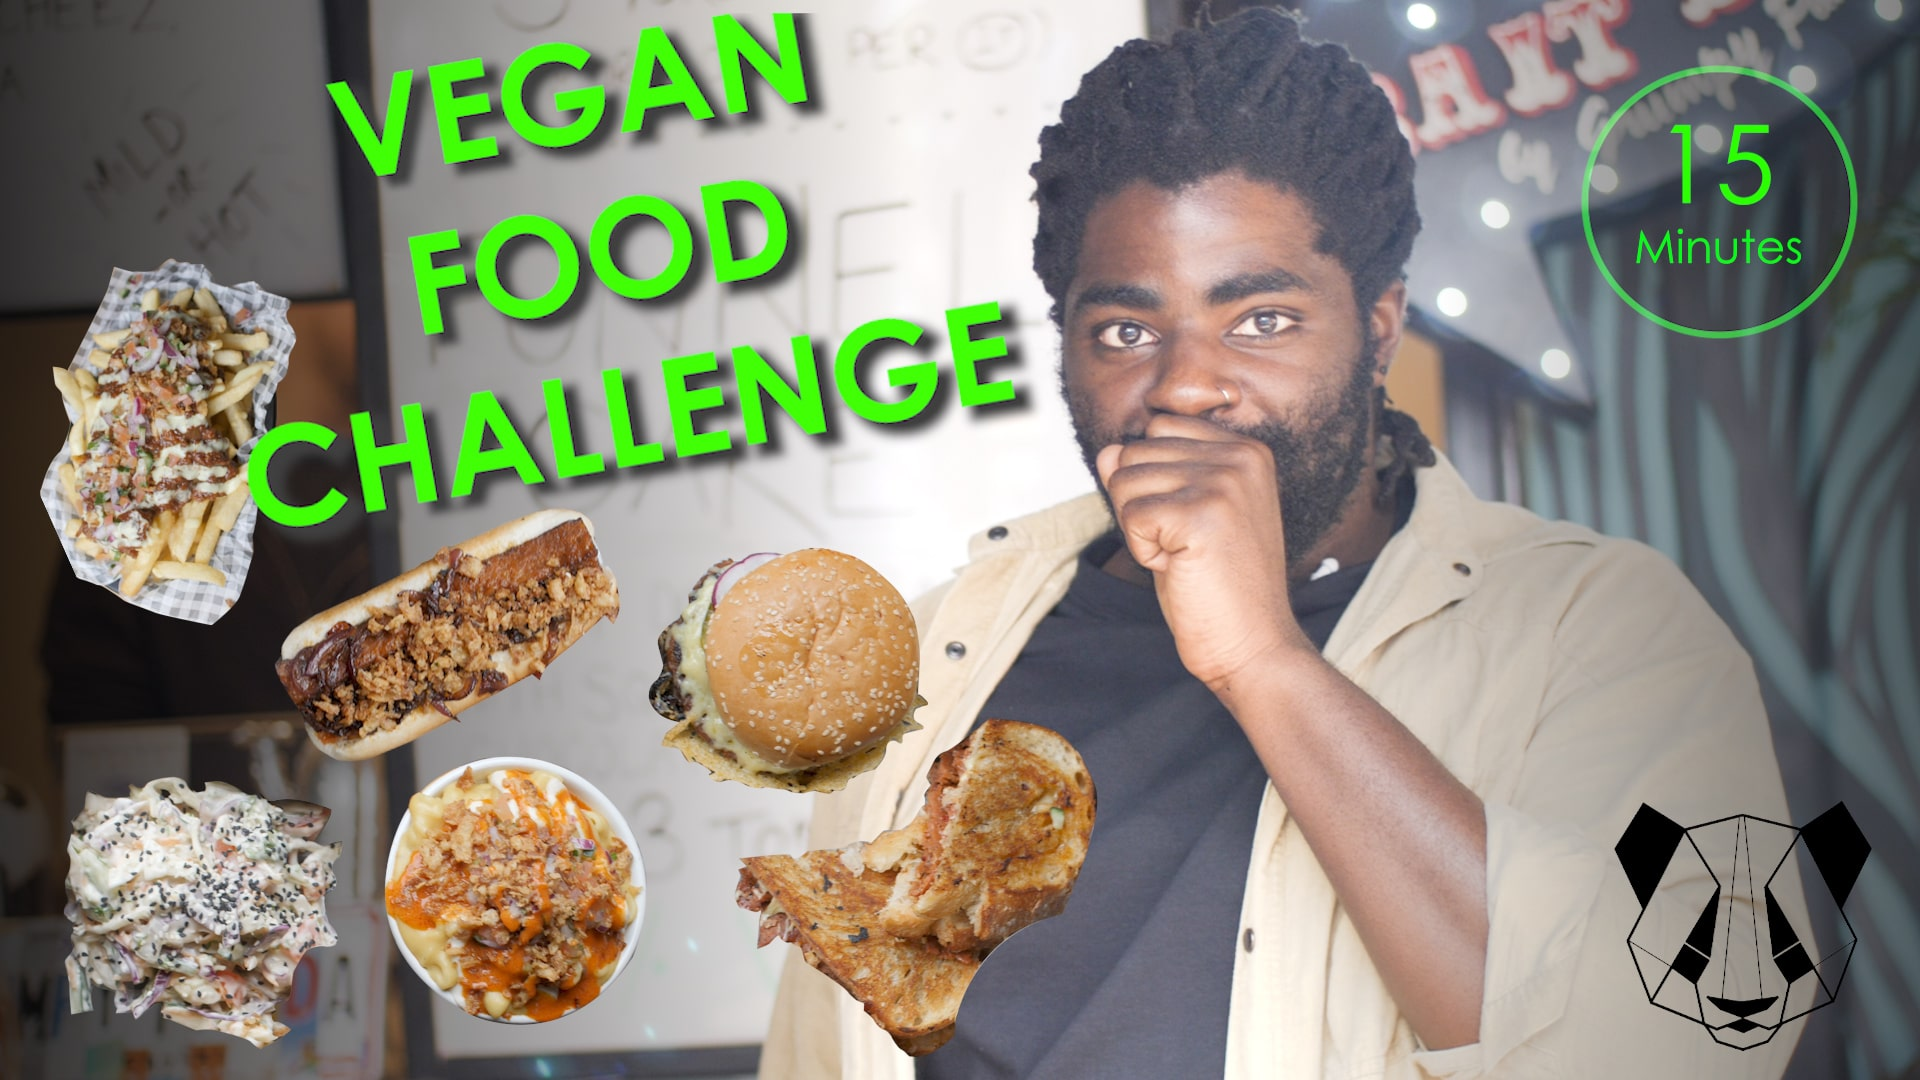 The Kraken Challenge image